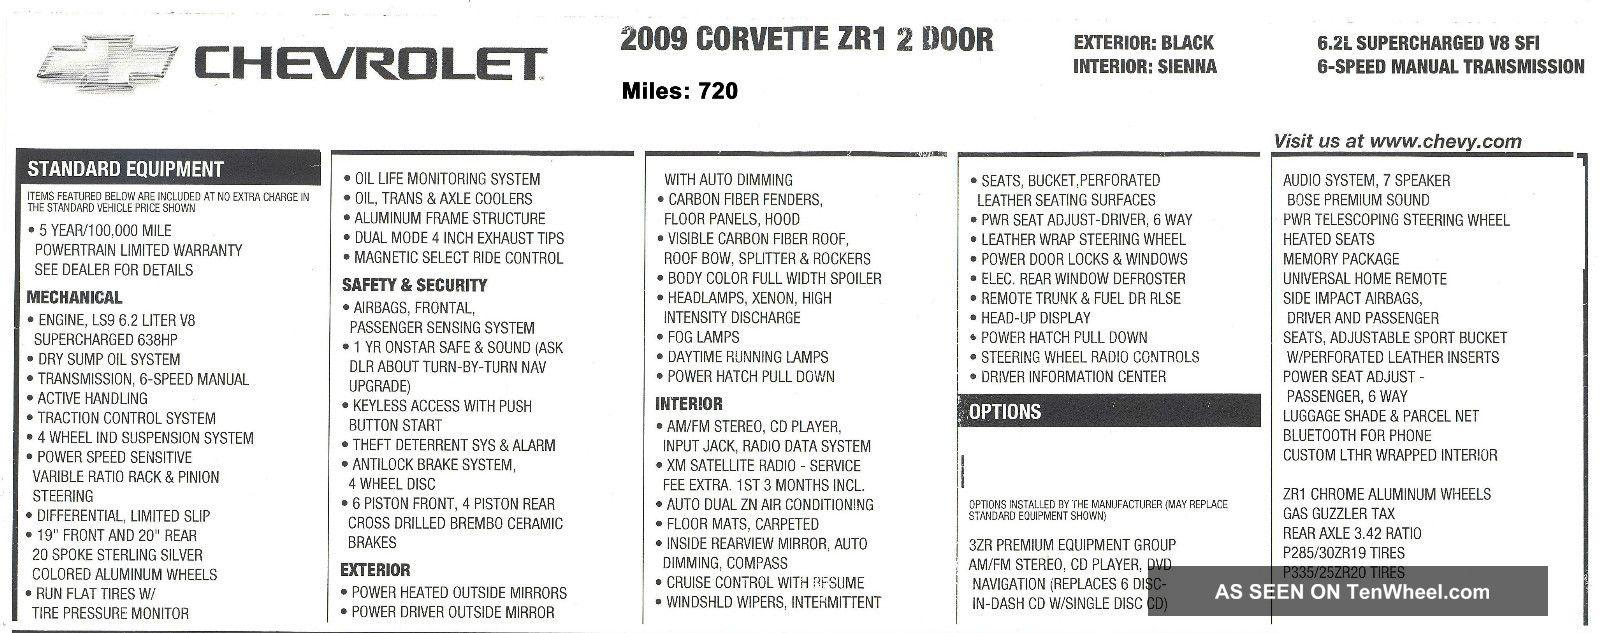 2009 chevrolet corvette zr1 coupe 2